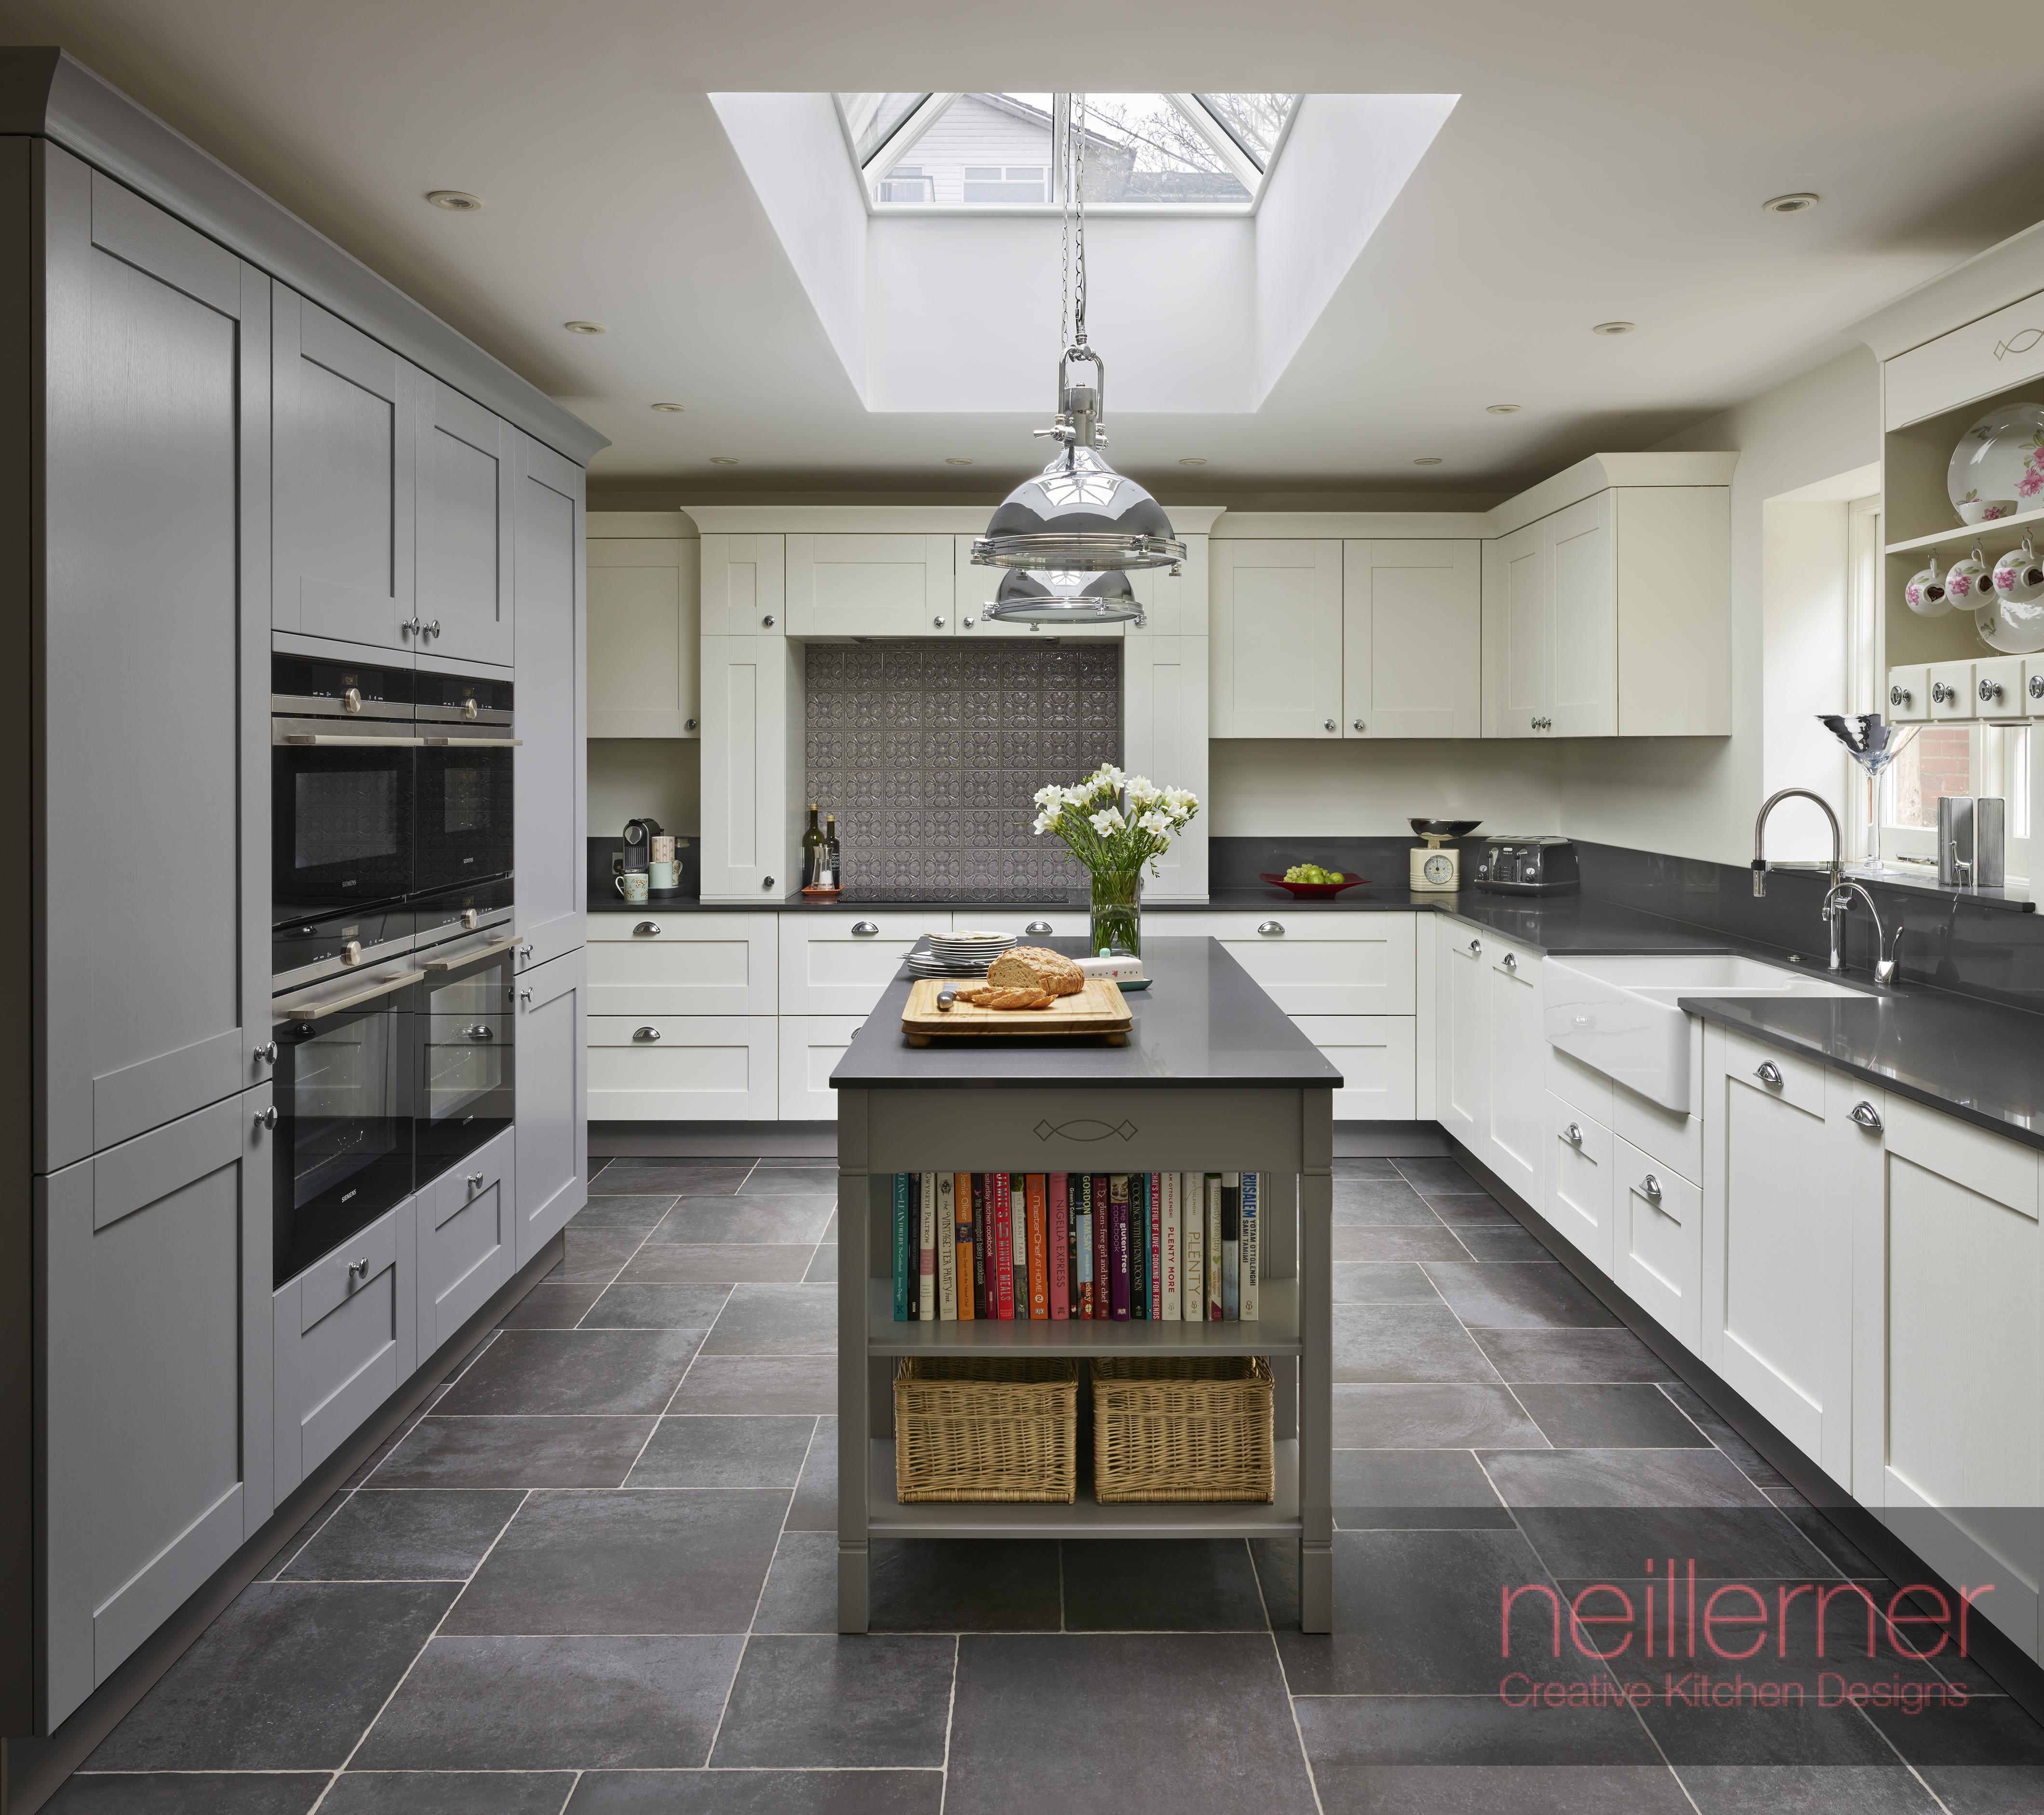 New Modern Kitchens At Neil Lerner: Bespoke Traditional Kitchen Designs London